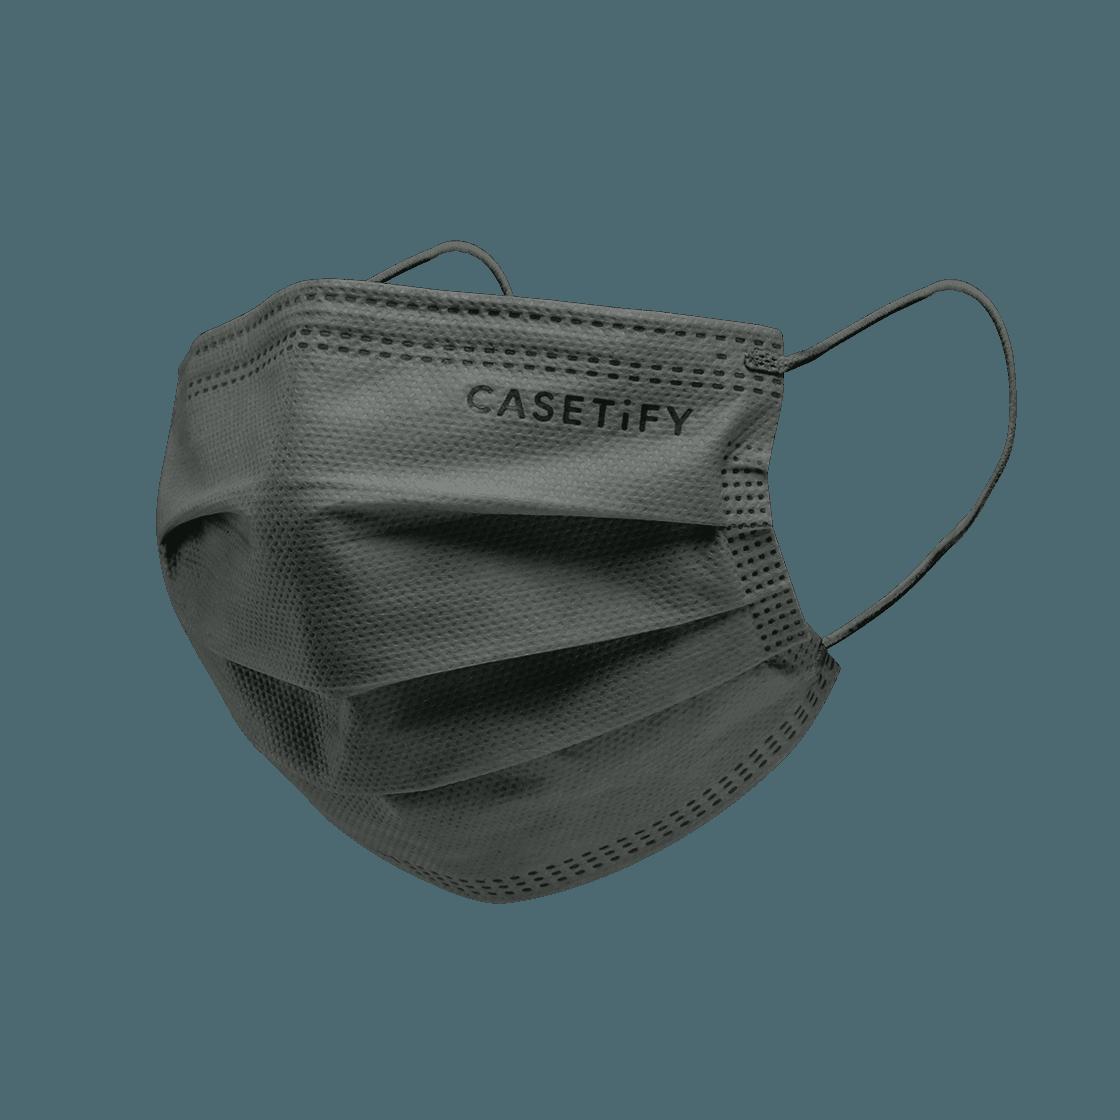 CASETiFY Disposable Mask 5pcs Box Set - Disposable Mask 5pcs Box Set - Charcoal (Dark Grey)